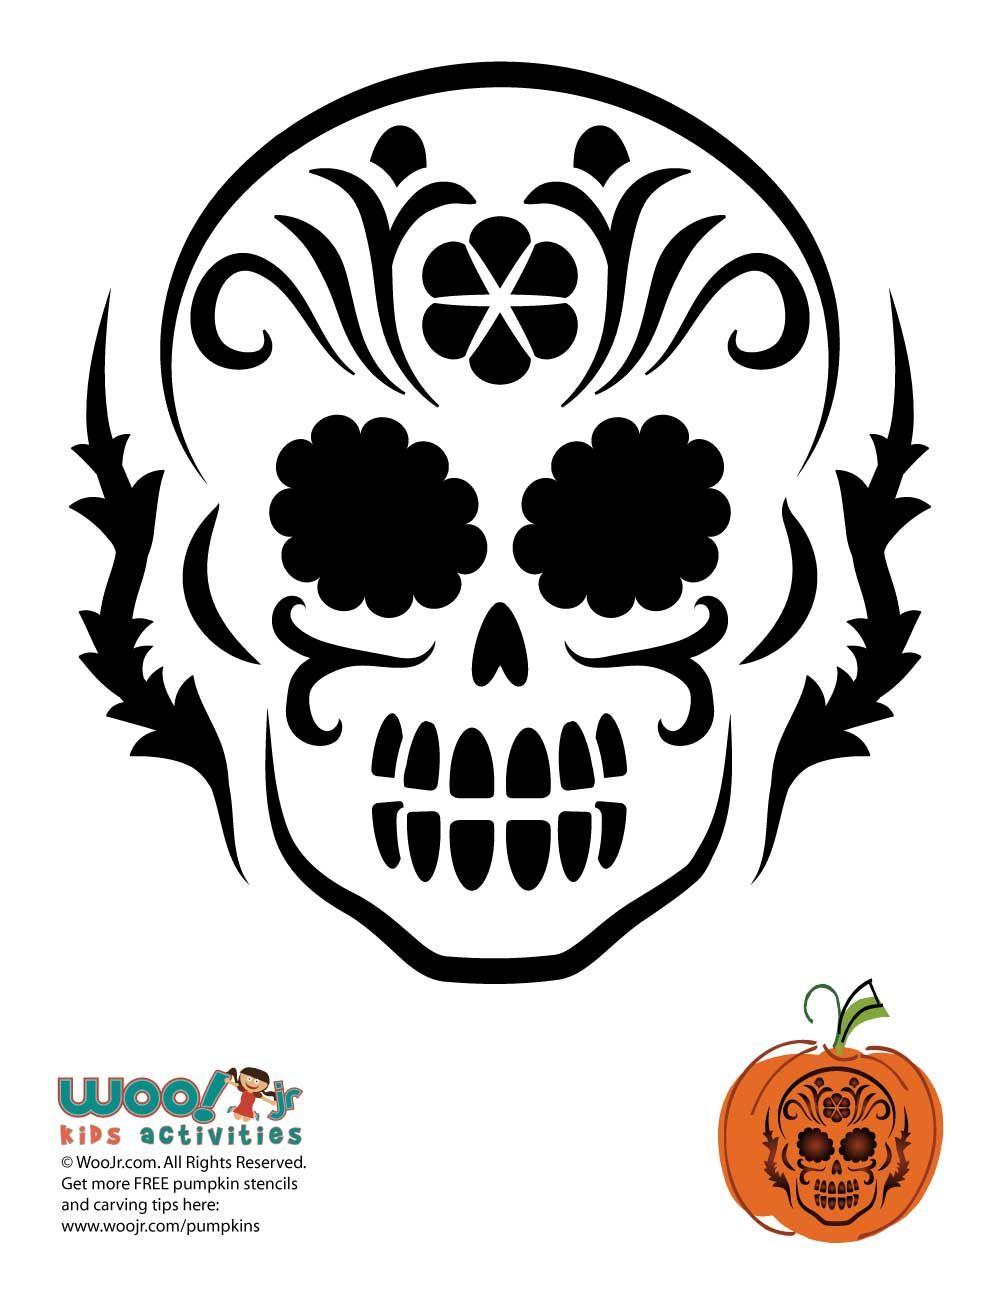 Dia De Los Muertos Skull Pumpkin Carving Halloween Pumpkin Stencils Skull Pumpkin Pumpkin Carvings Stencils